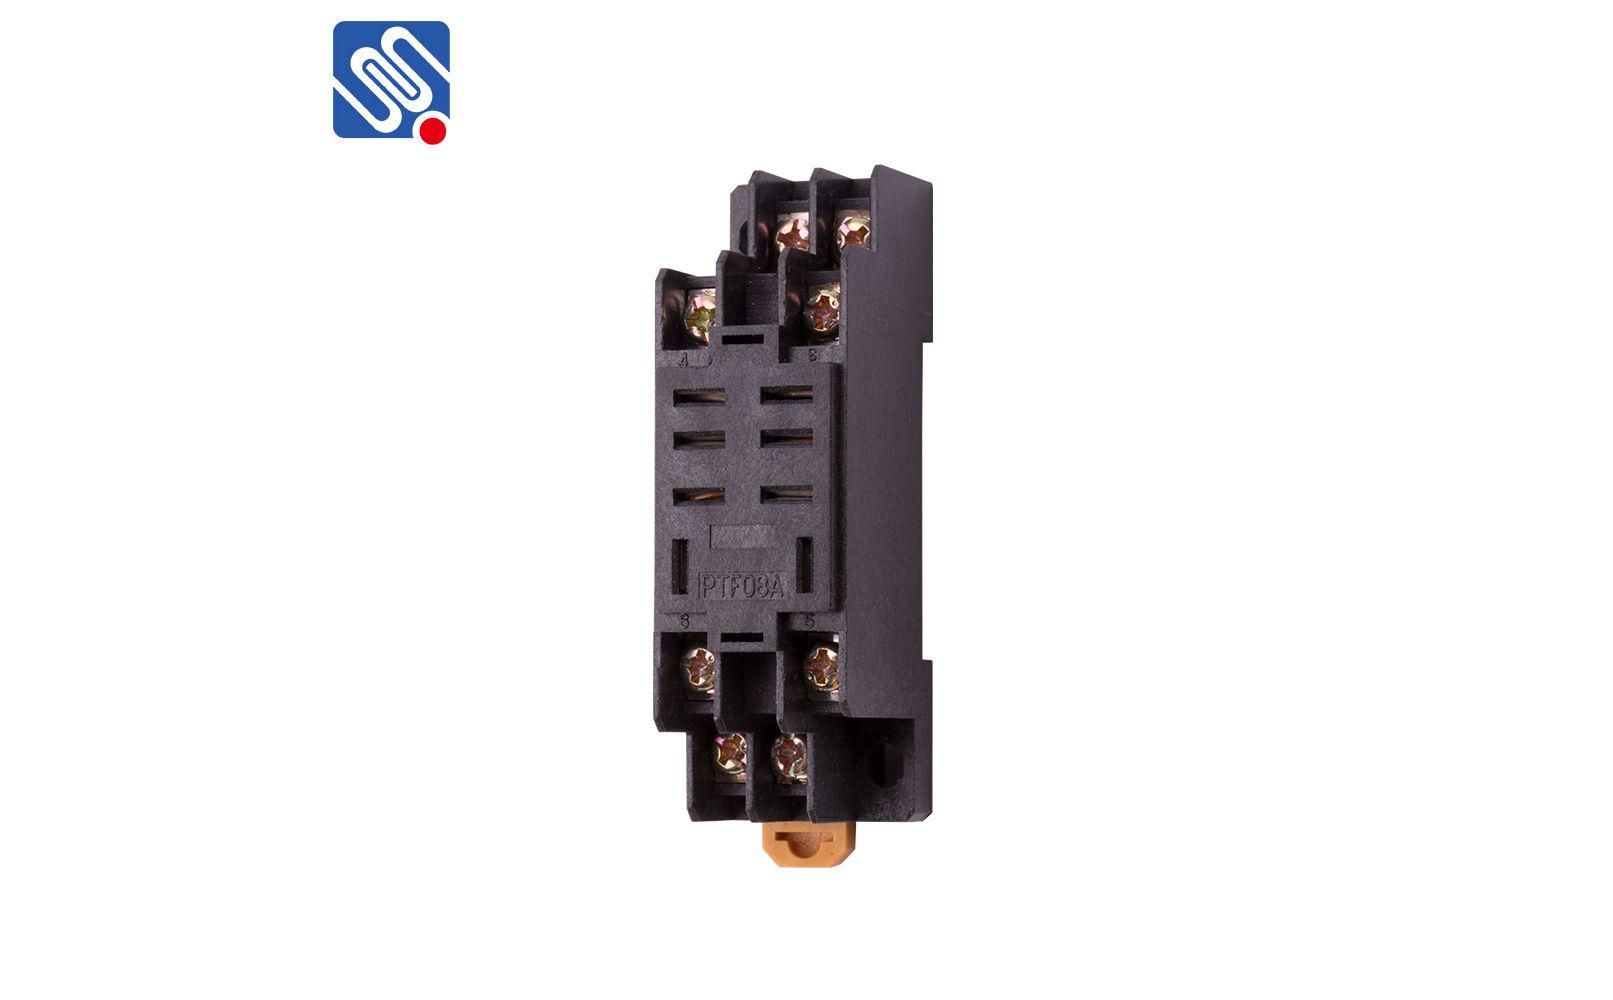 8 Pin Relay Base Diagram Uff08ptf08a   Meishuoen